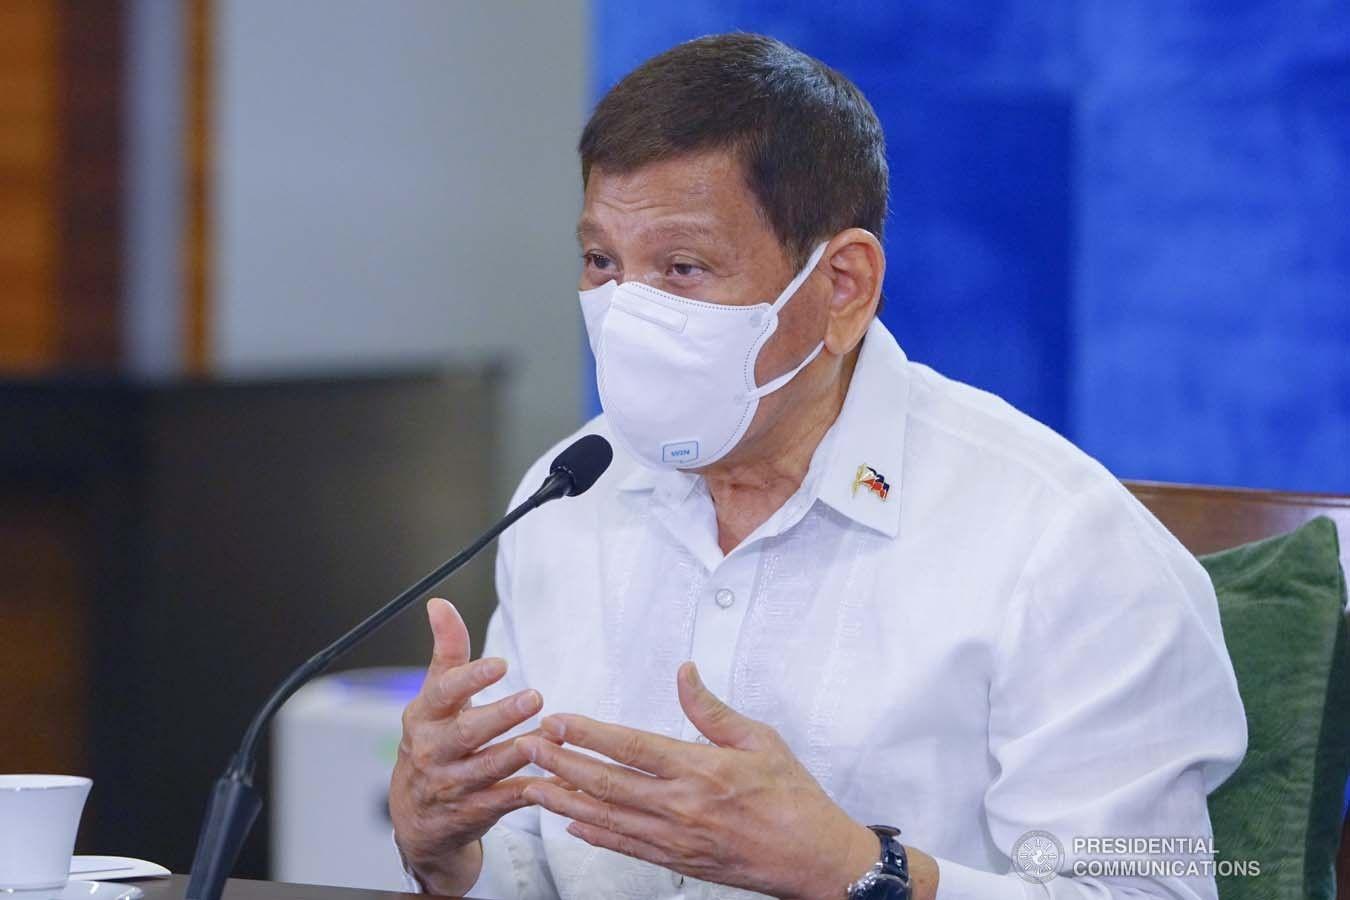 San Beda alumni to Duterte: Take back remarks on West Philippine Sea row